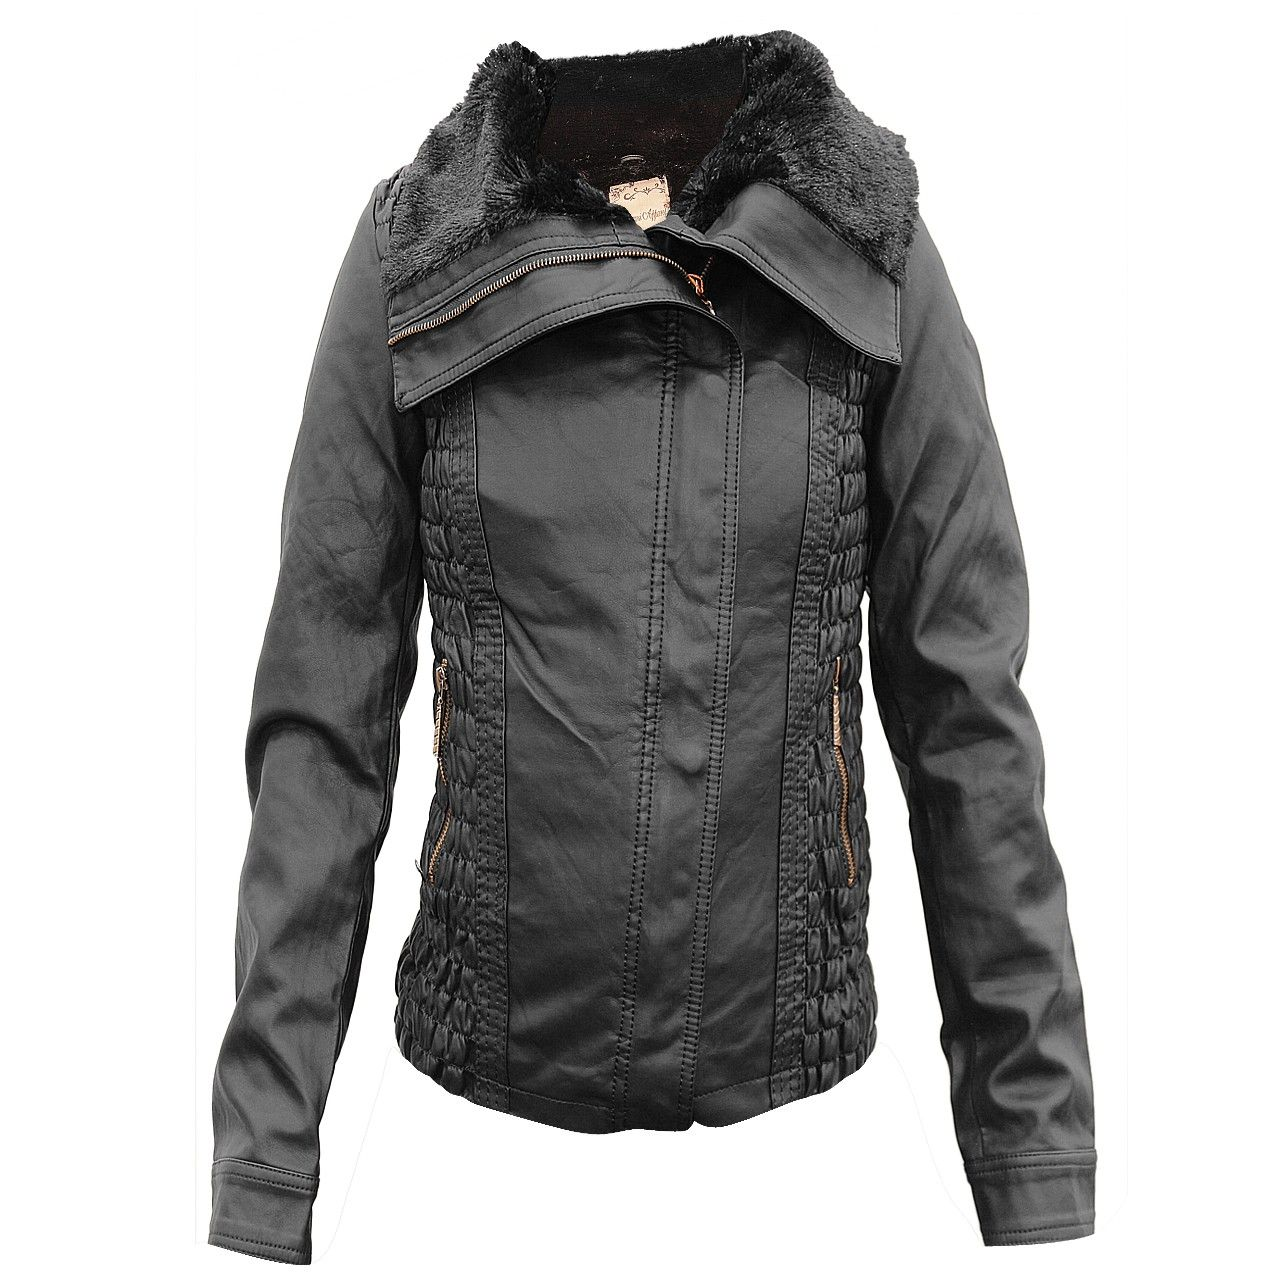 #style #mujer #moda #look #outfit #otoño #jacket #black